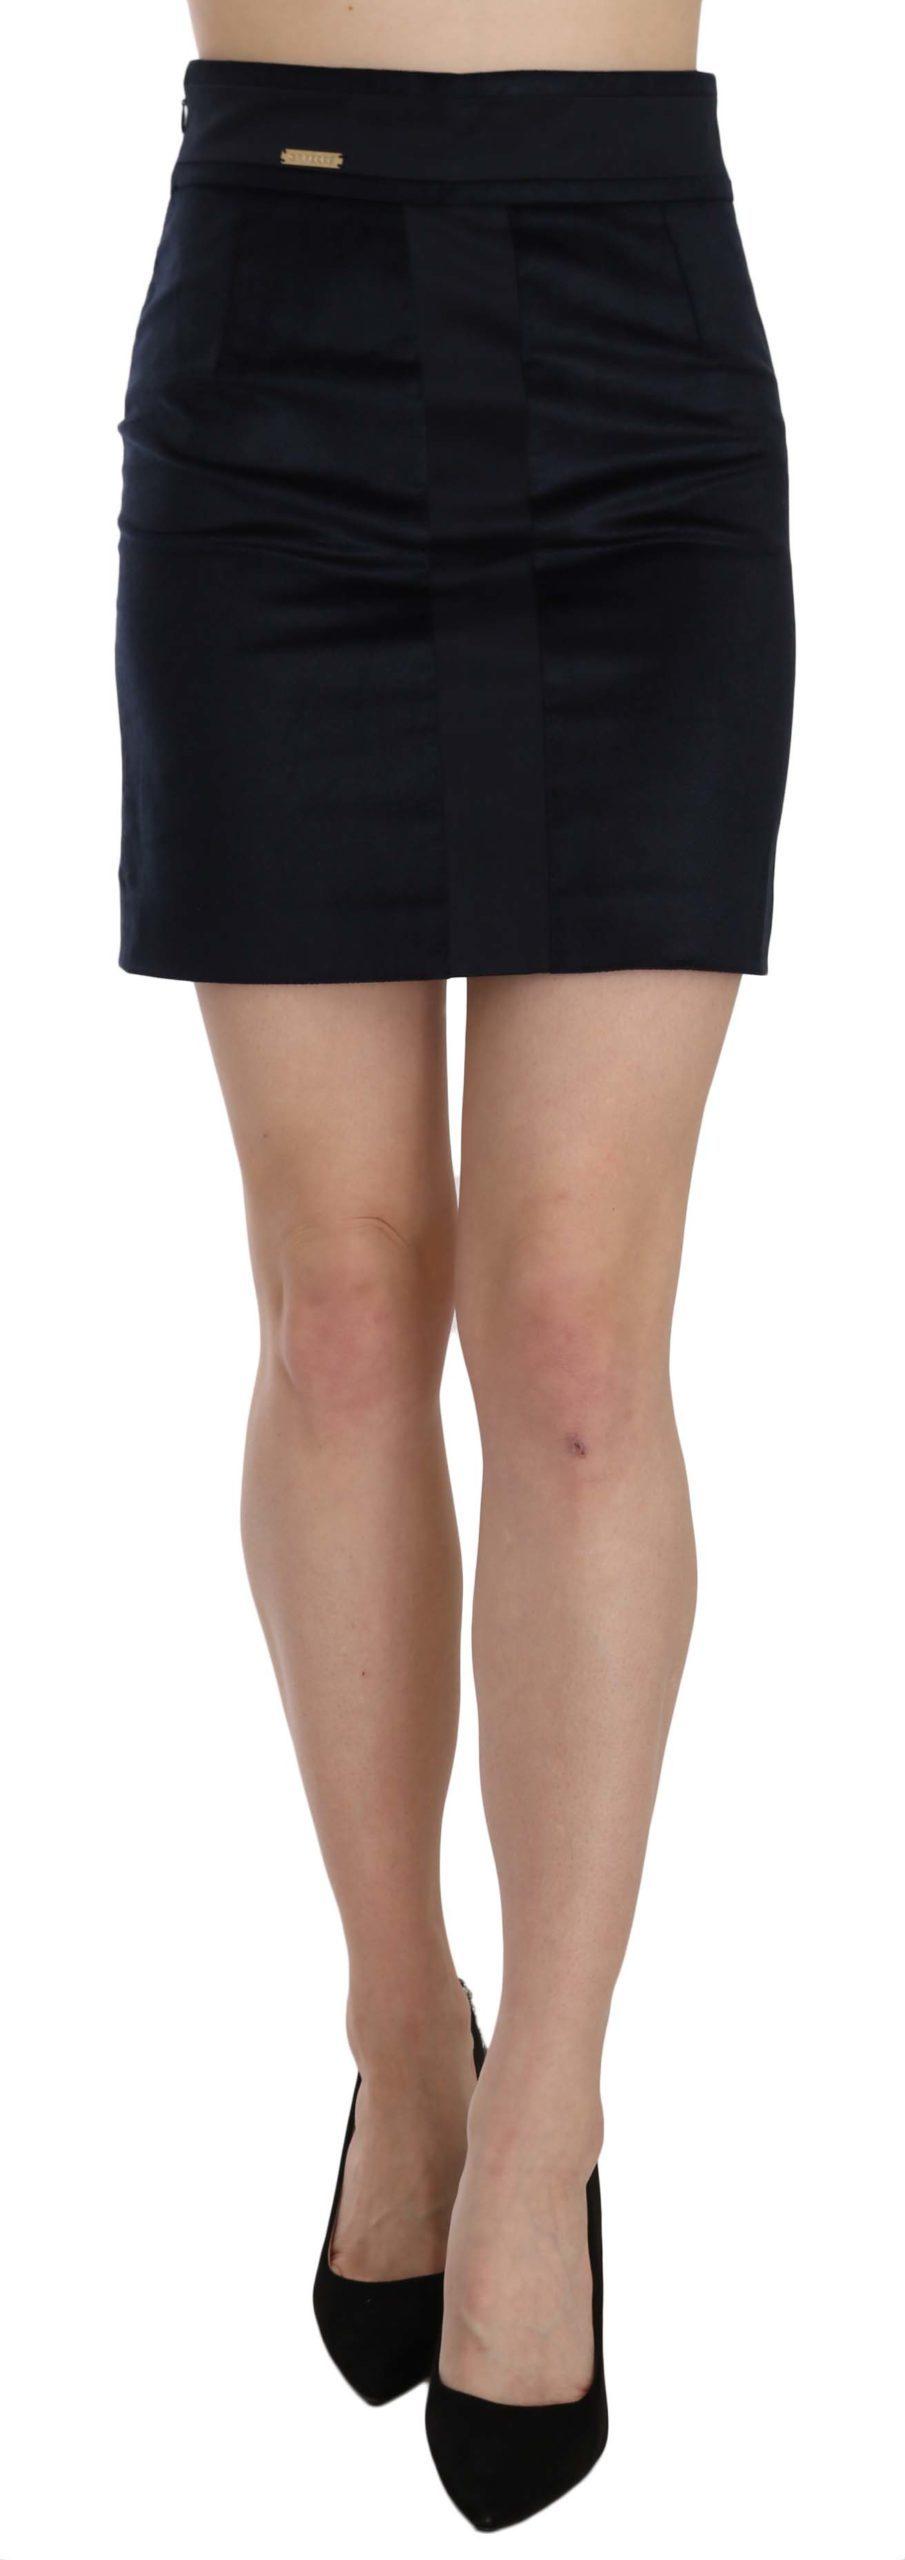 GF Ferre Women's Cotton Blend High Waist A-line Mini Skirt Blue TSH3948 - IT42|M